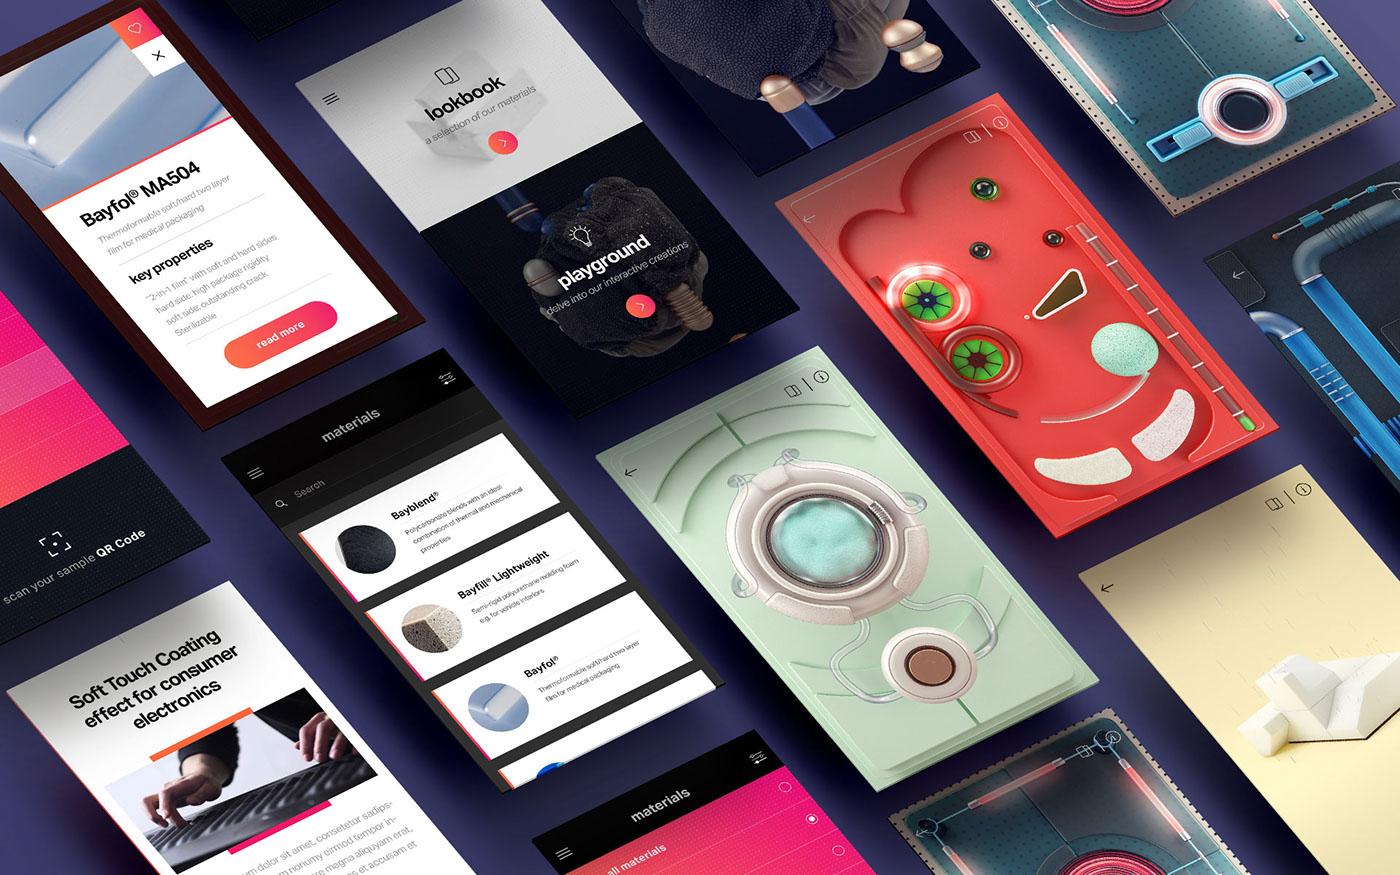 COVESTRO app motion design CGI ux UI psd Interface material